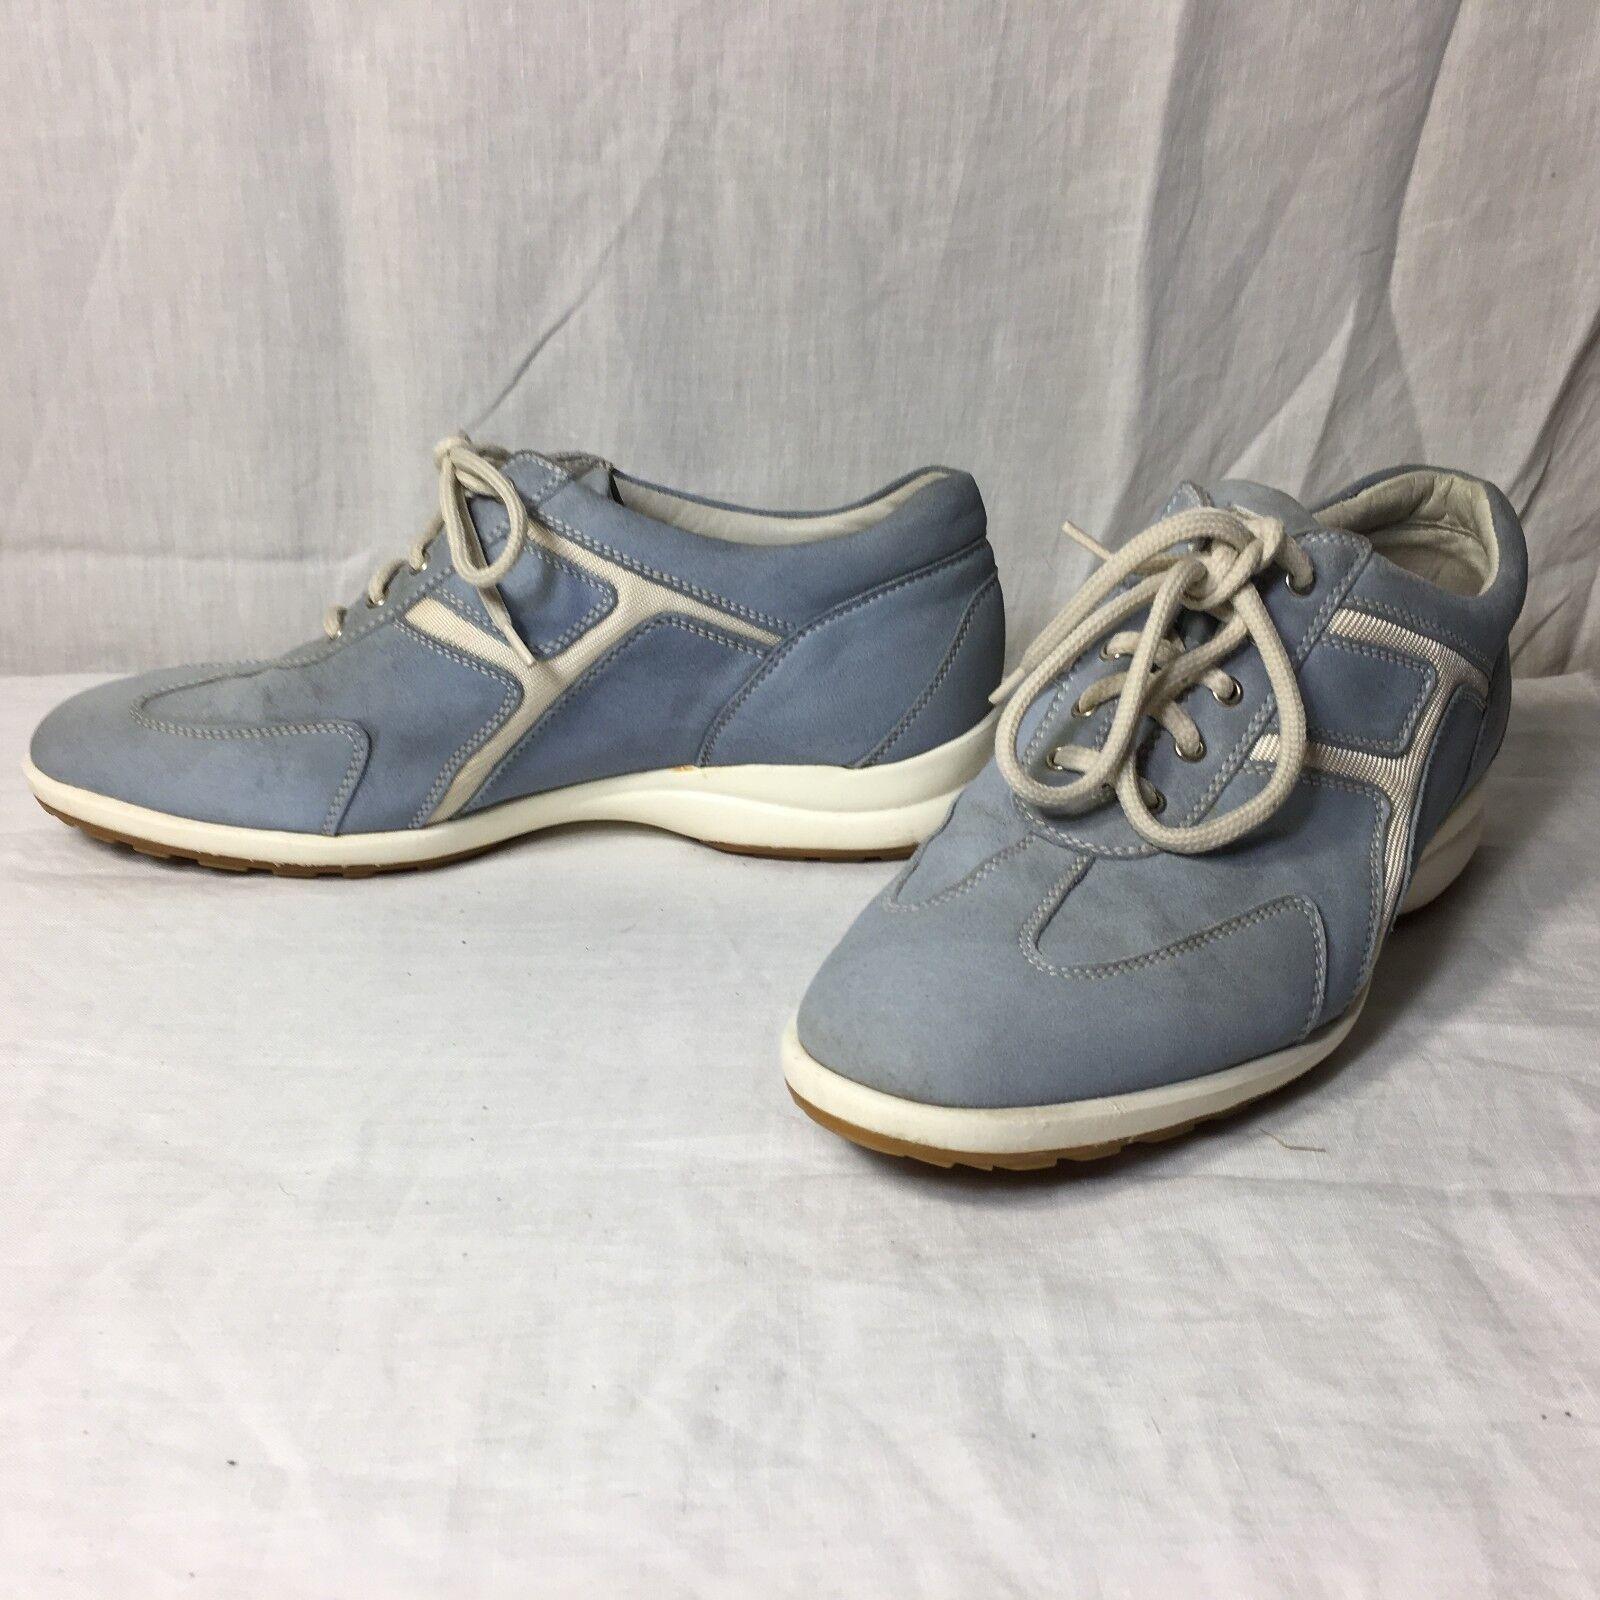 fratelli rossetti flexa chaussures bleues de baskets italie prime nous 9 narrow italie baskets 65900c